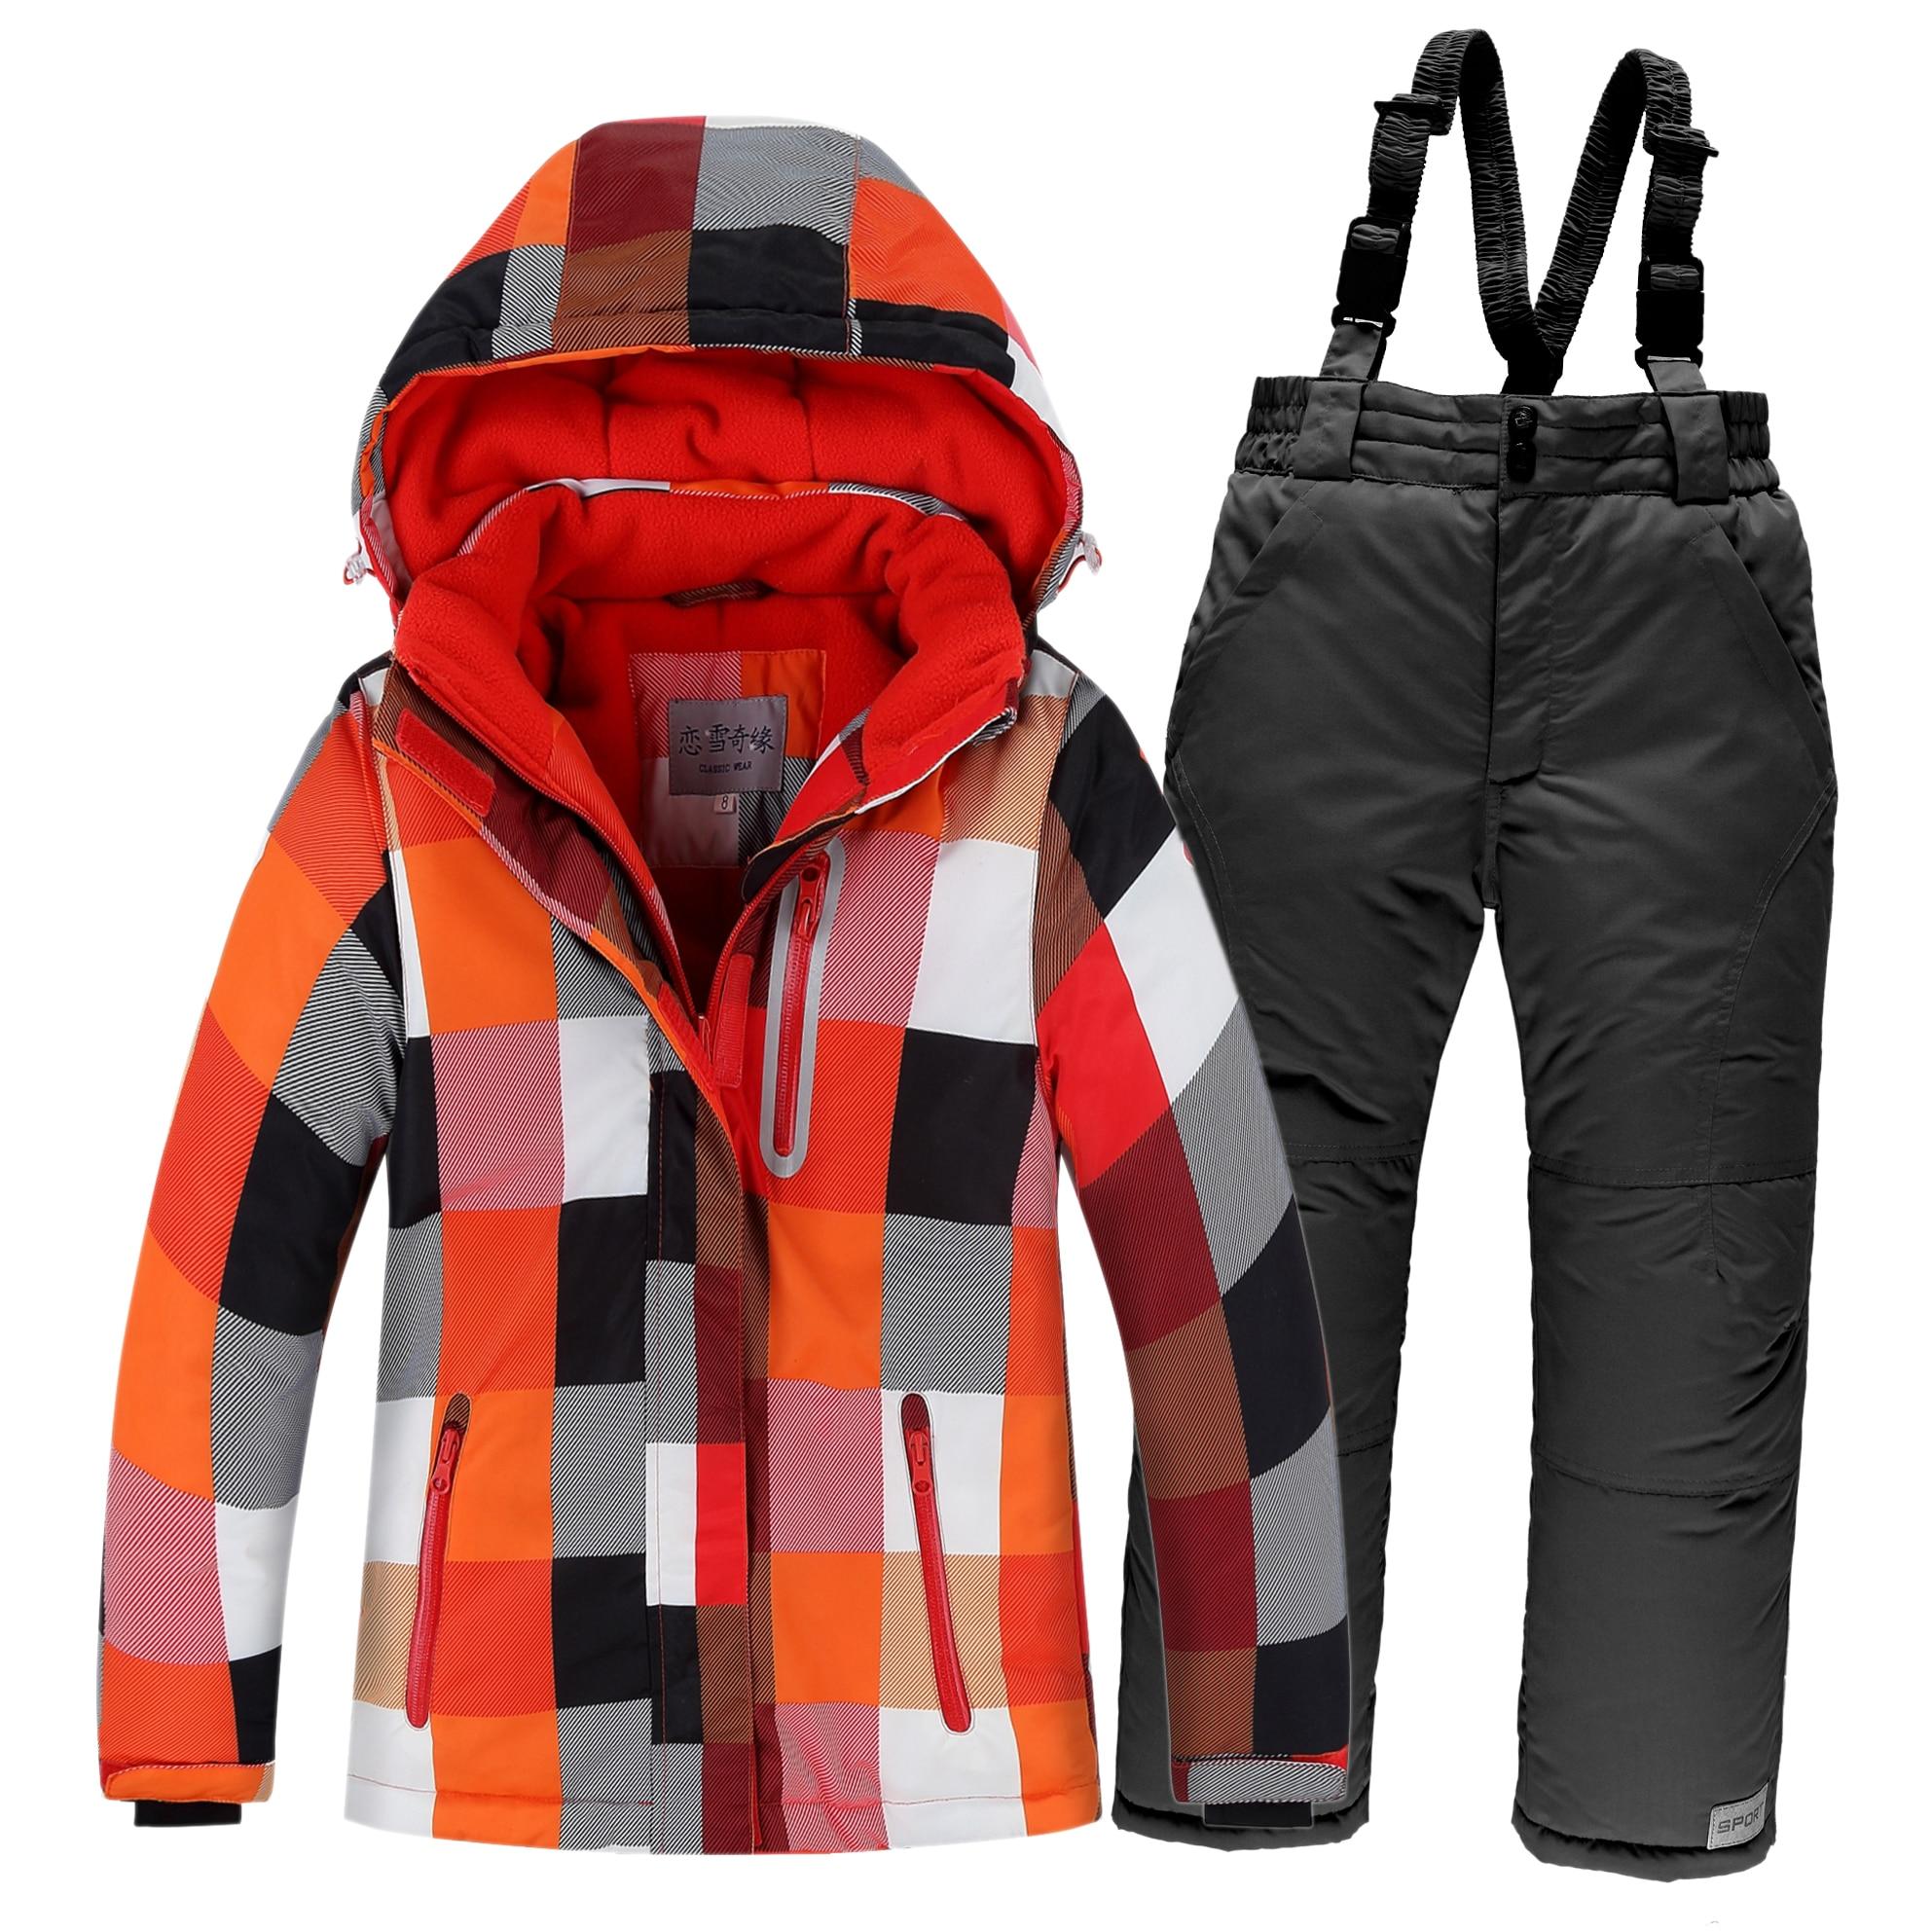 OLEKID Winter Children Ski Suit Windproof Warm Girls Clothing Set Jacket + Overalls Boys Clothes Set 3-16 Years Kids Snow Suits